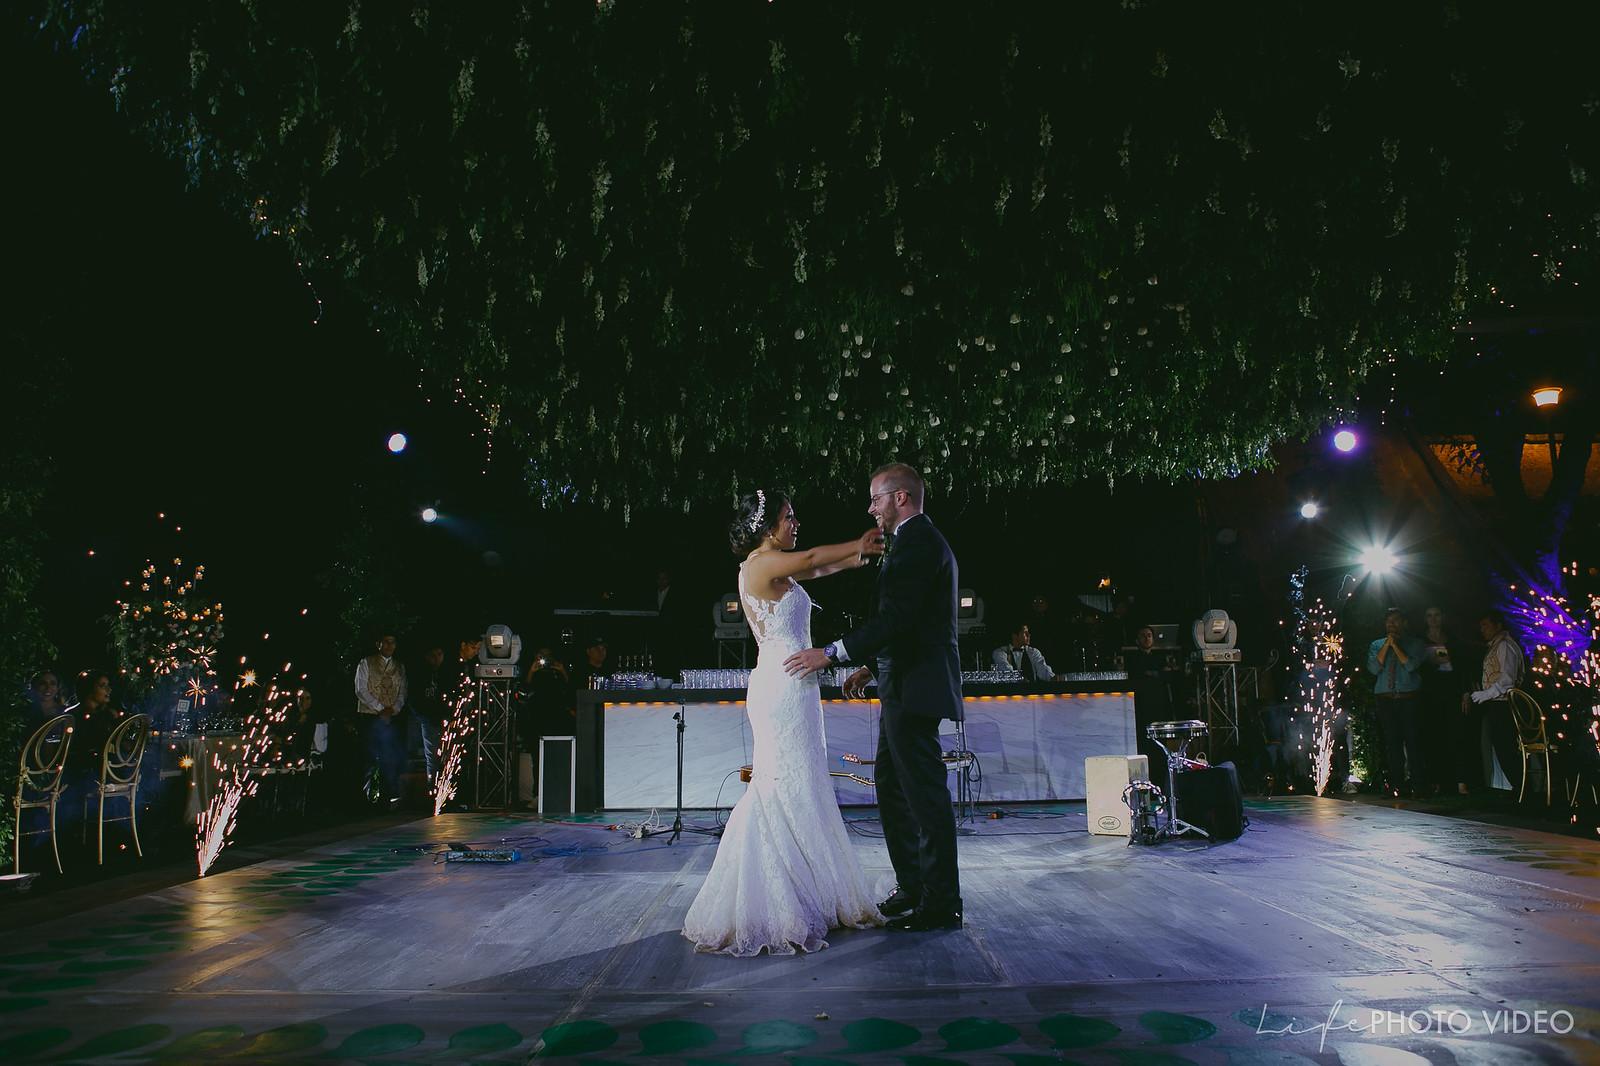 LifePhotoVideo_Boda_Guanajuato_Wedding_0056